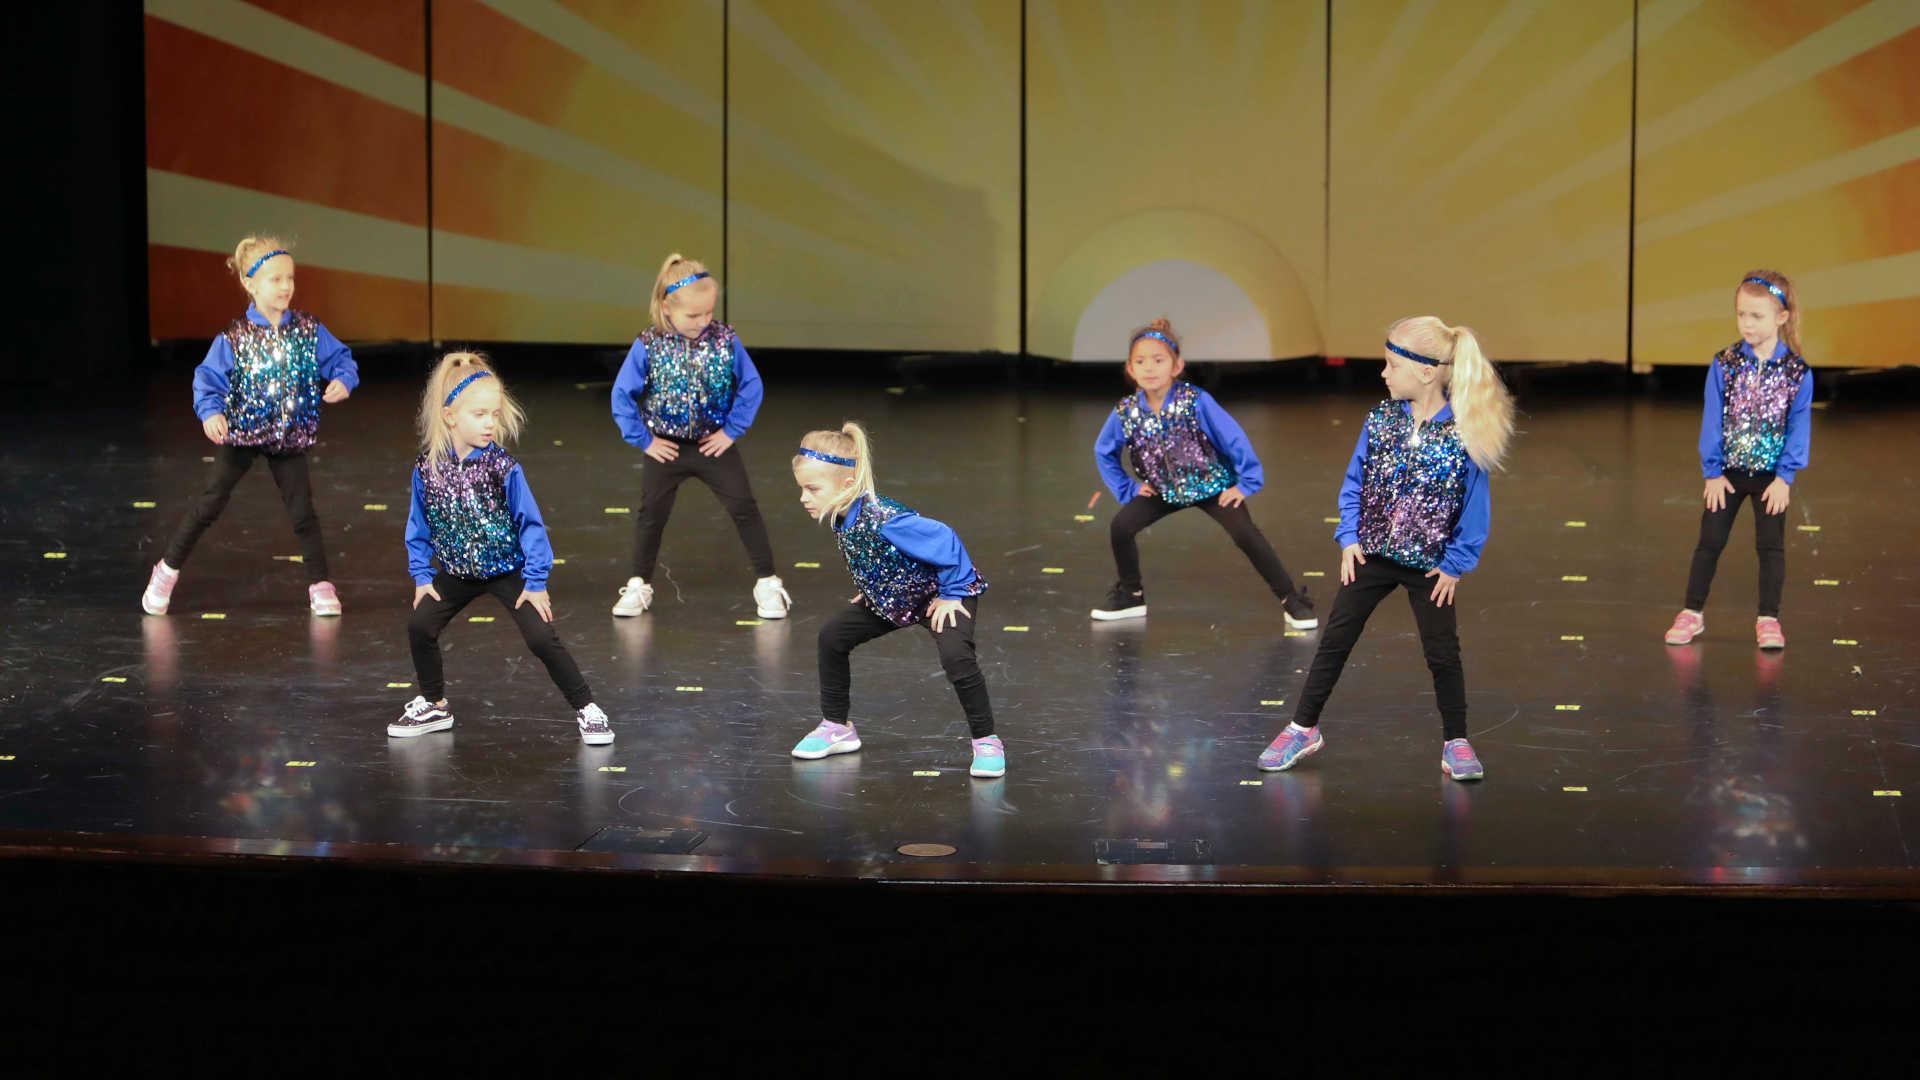 Dance Class Attire